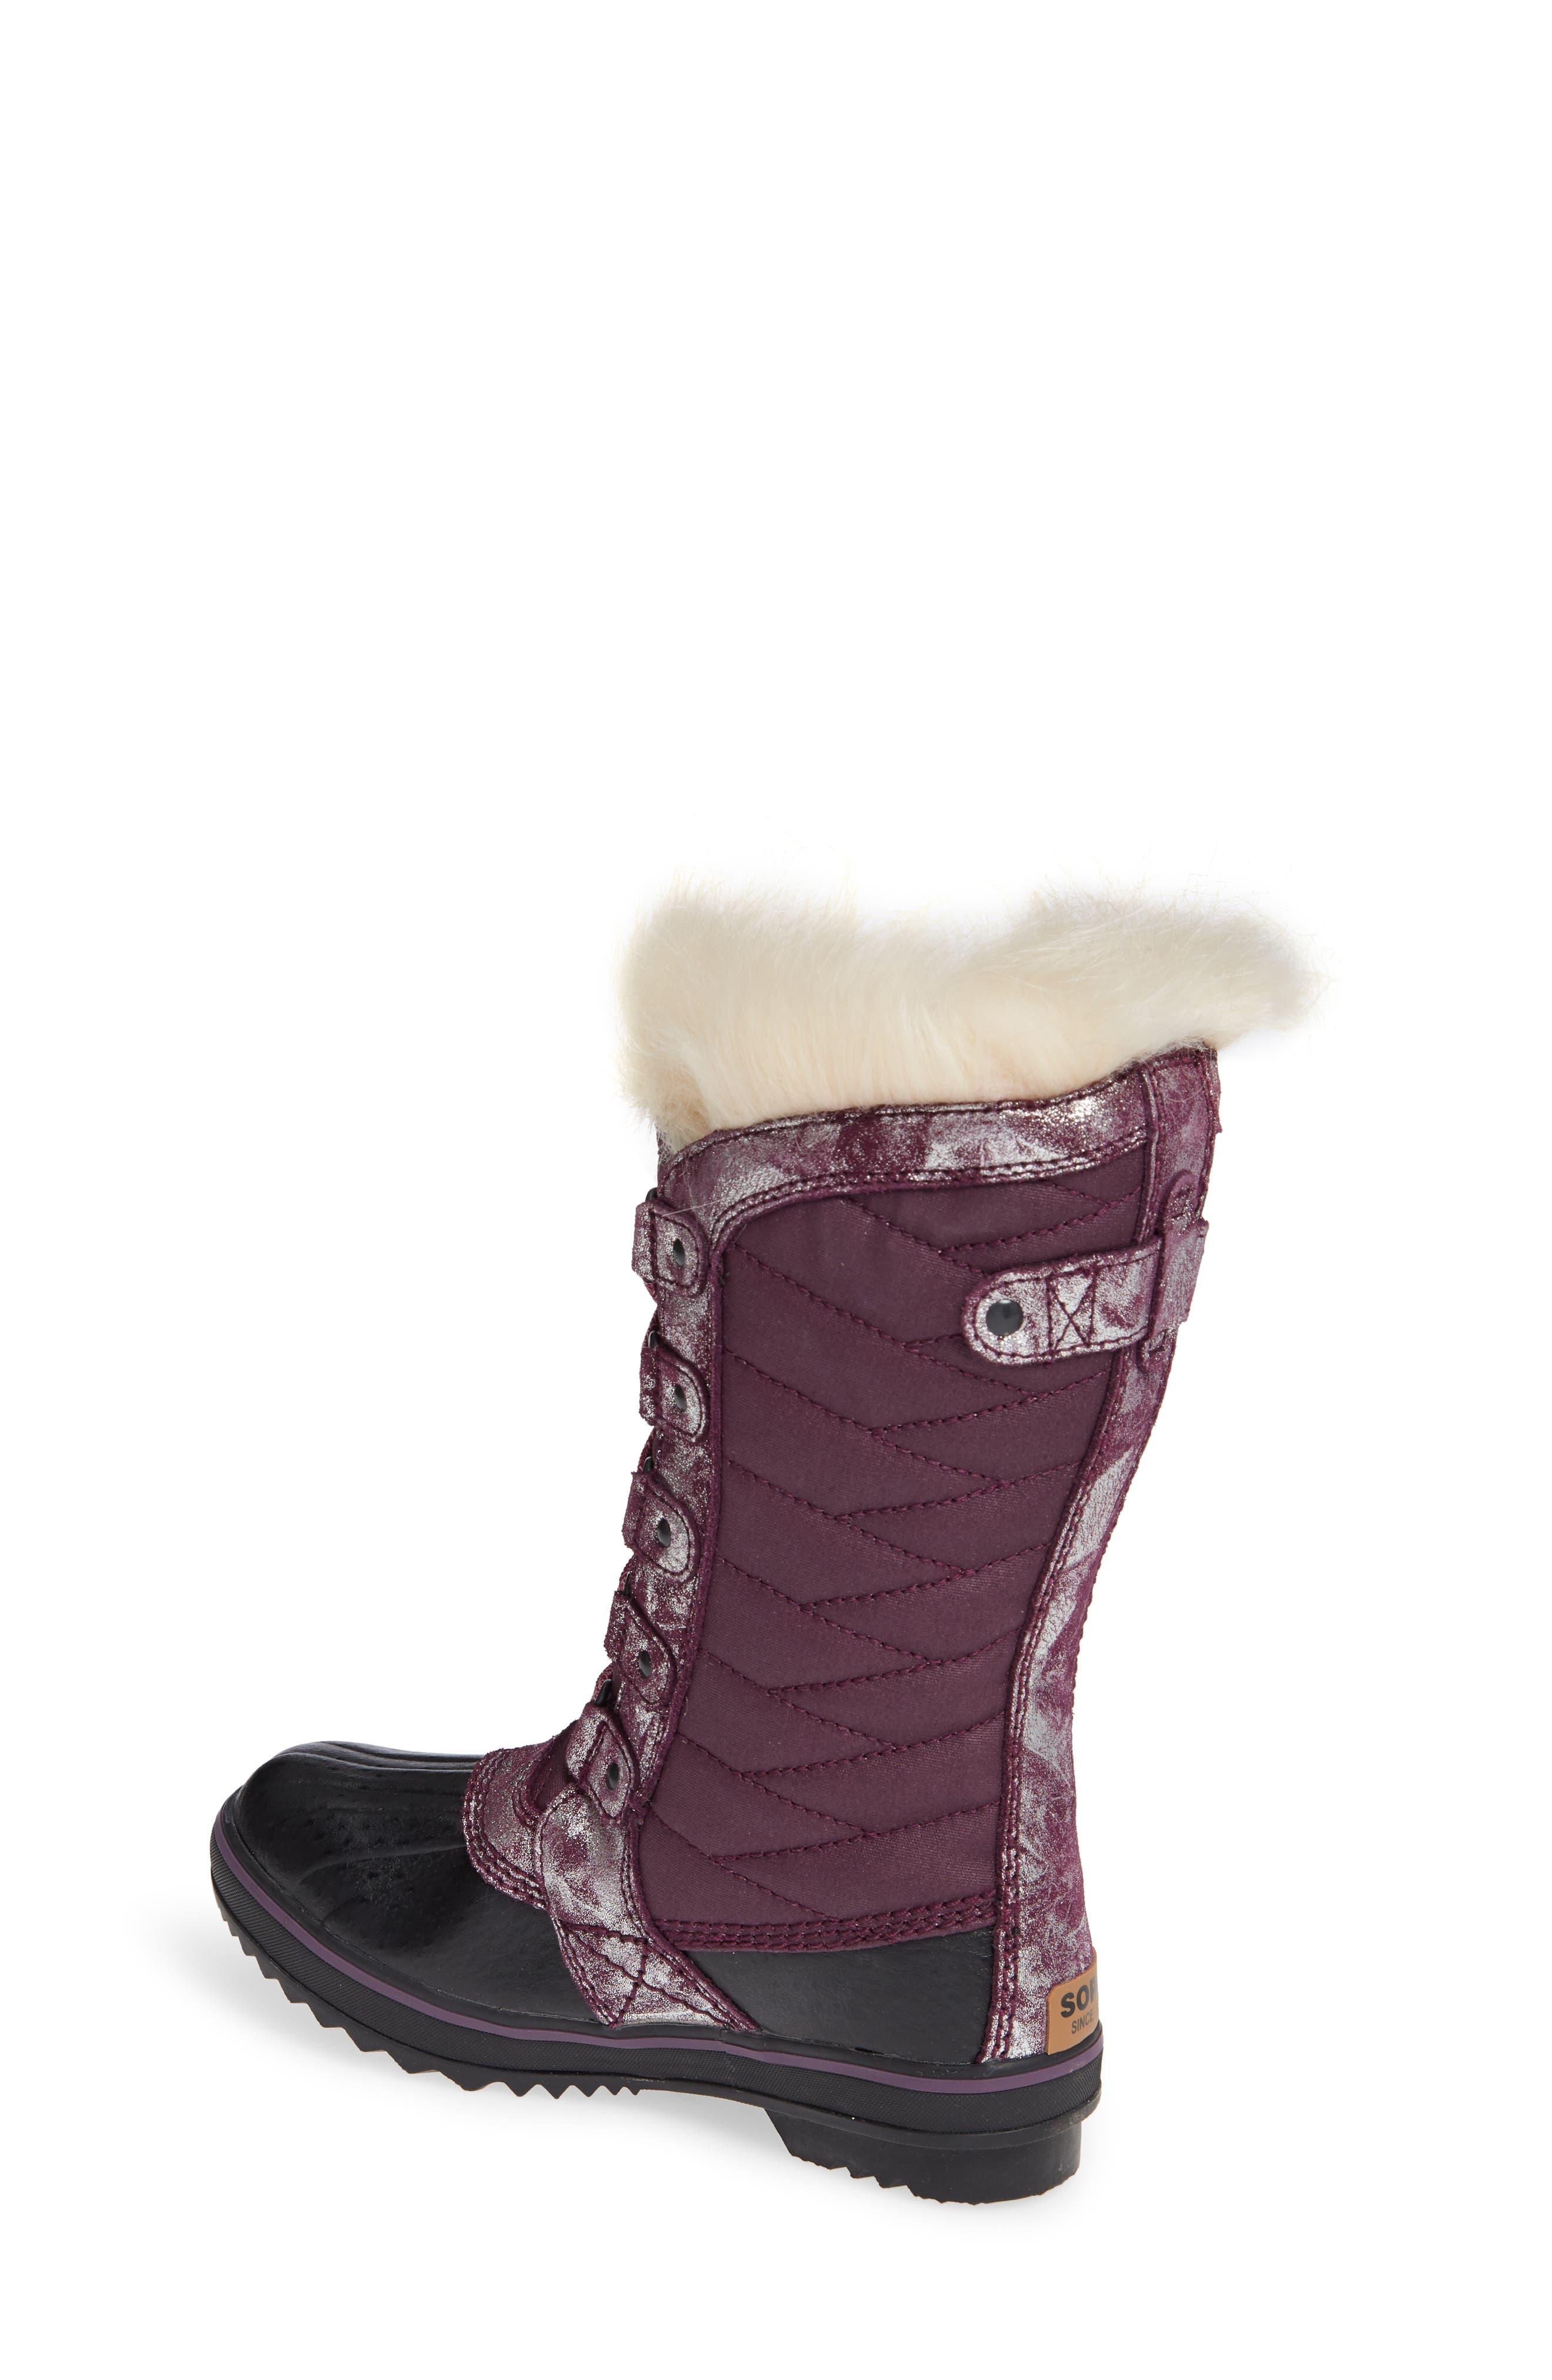 Tofino II Faux Fur Lined Waterproof Boot,                             Alternate thumbnail 2, color,                             562